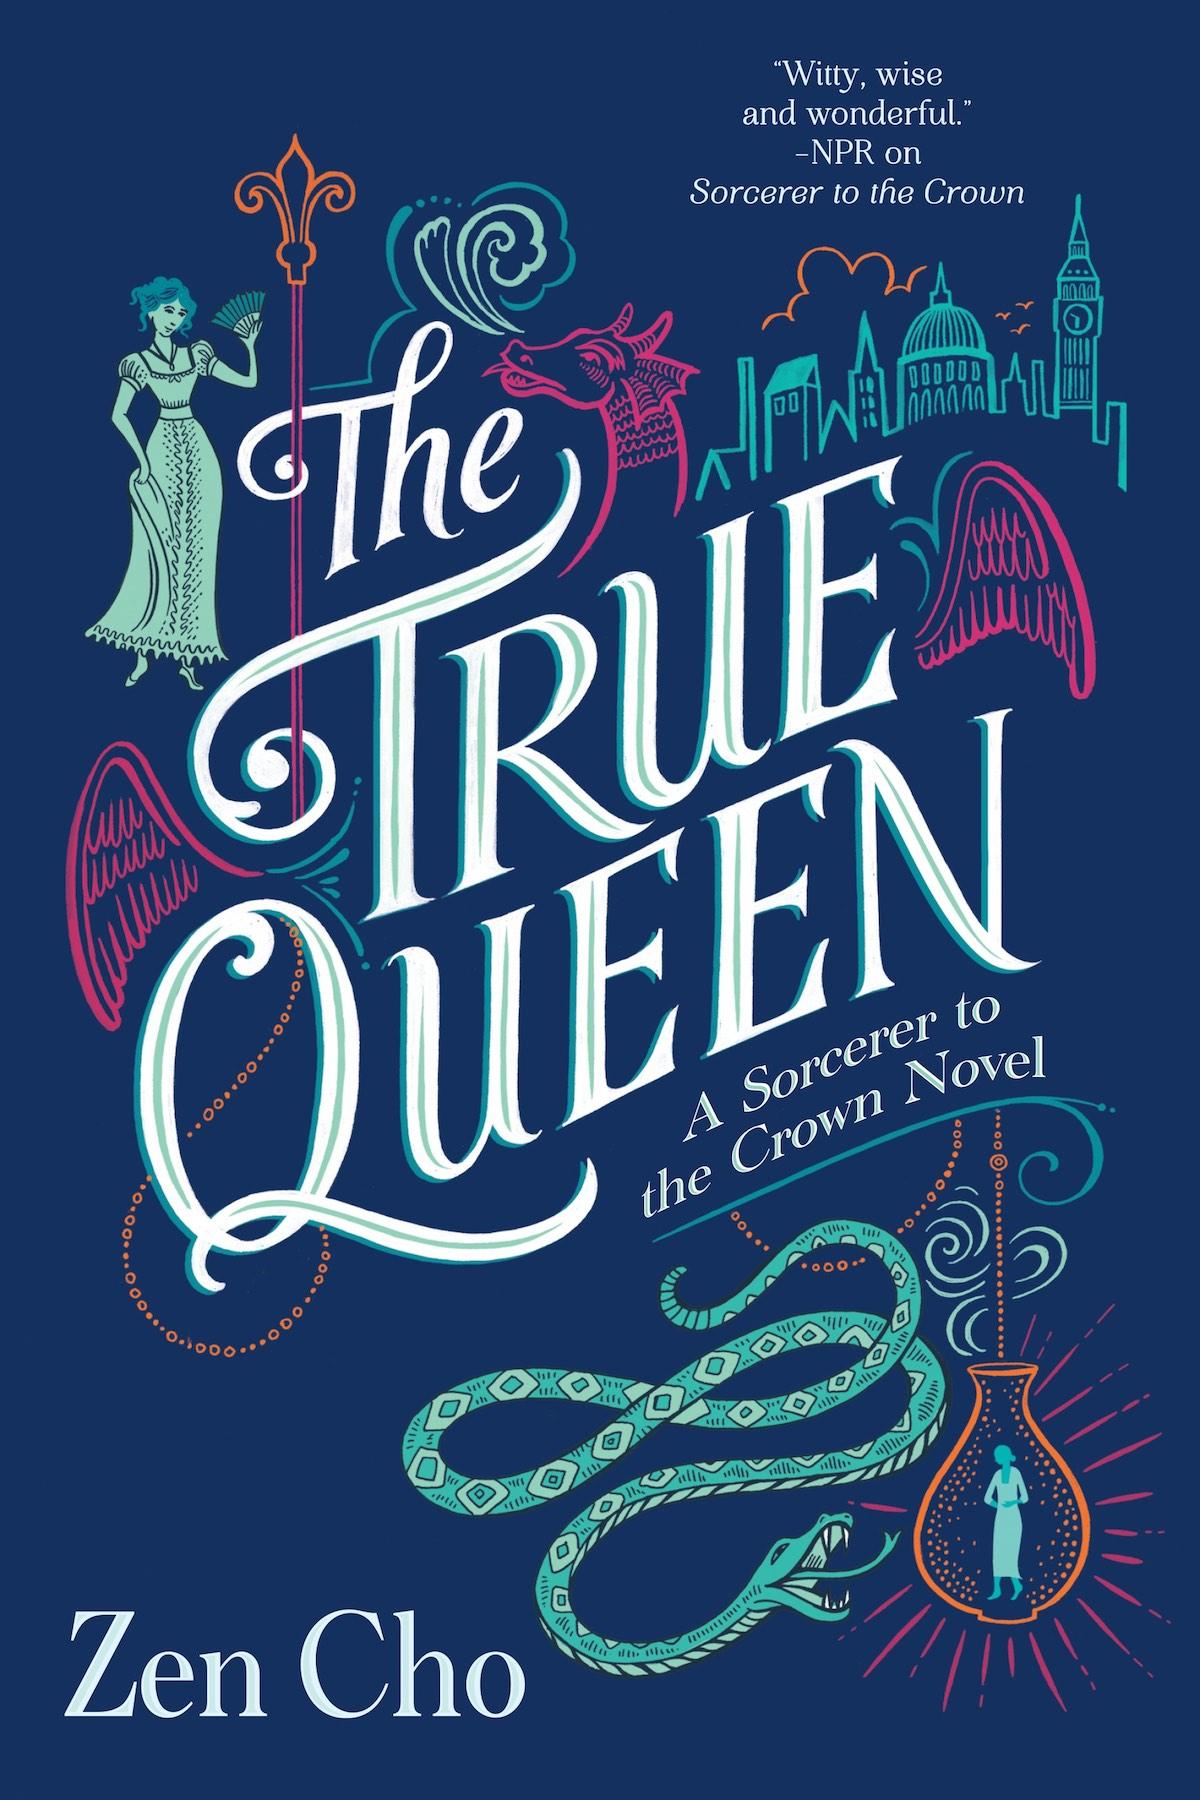 Magical Intrigue: Revealing The True Queen by Zen Cho